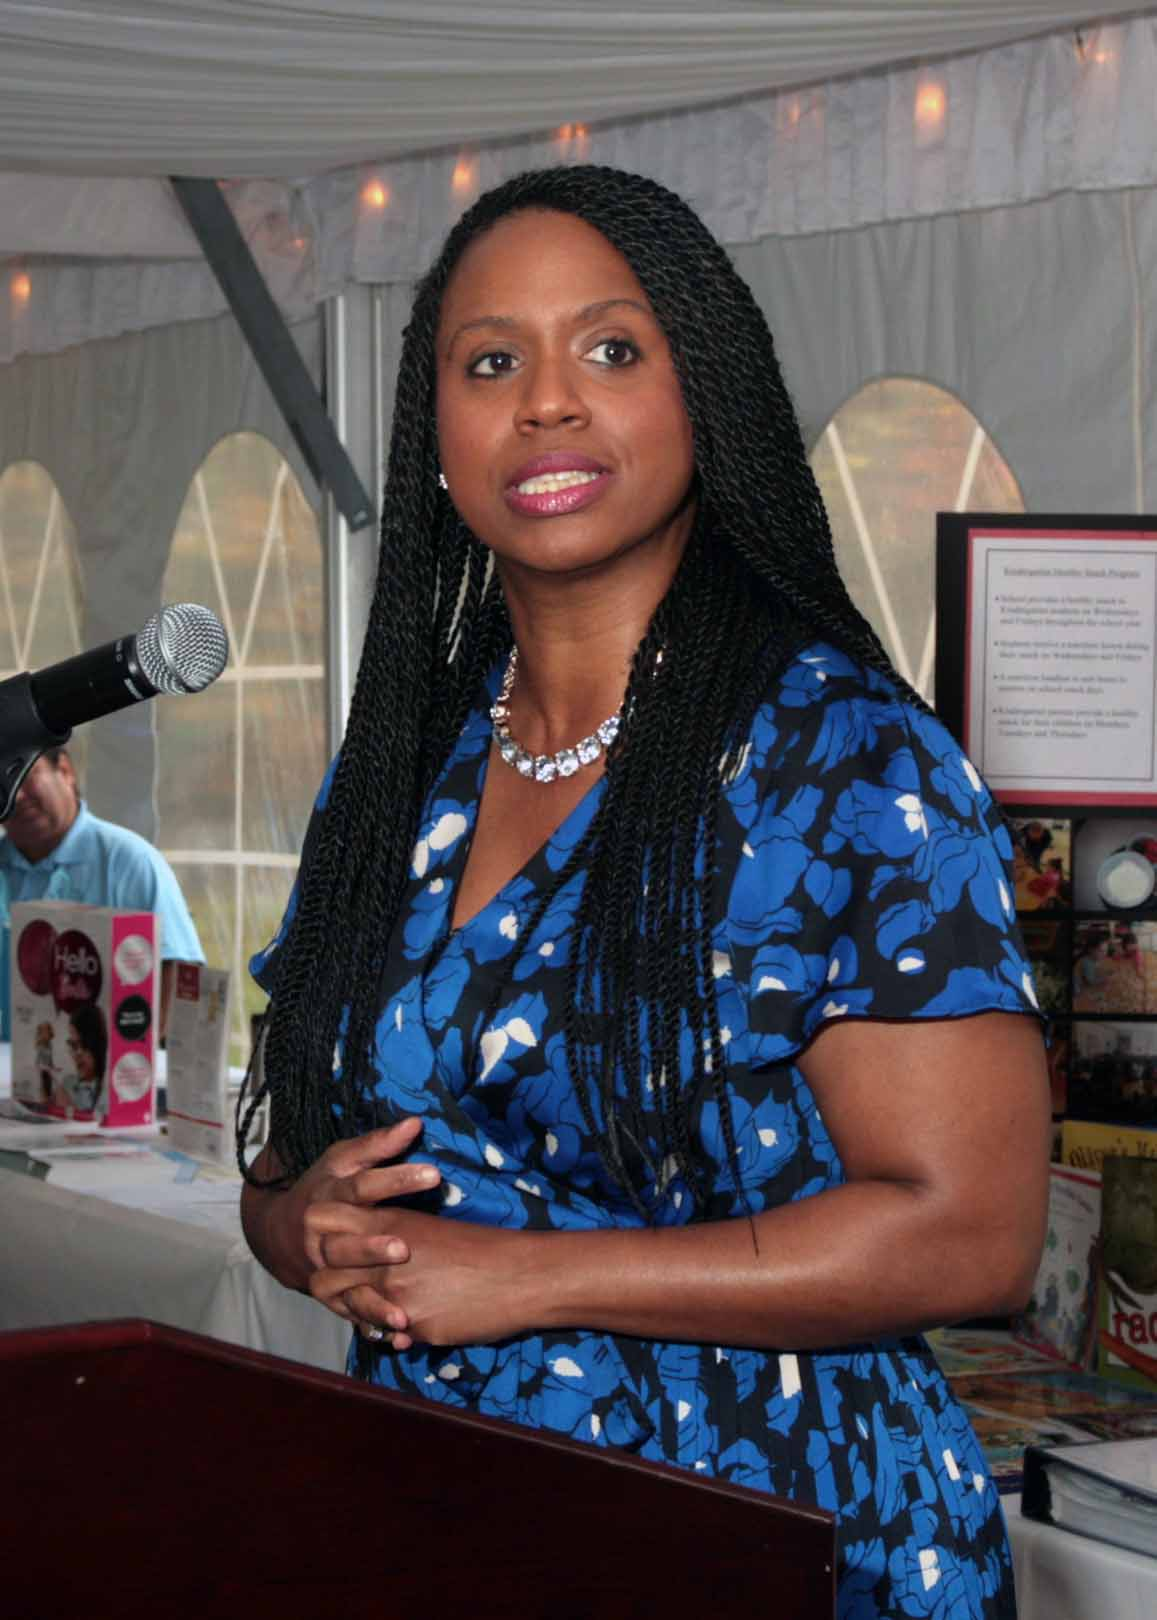 Ayanna Pressley, Boston City Councilwoman, Morning Keynote Speaker